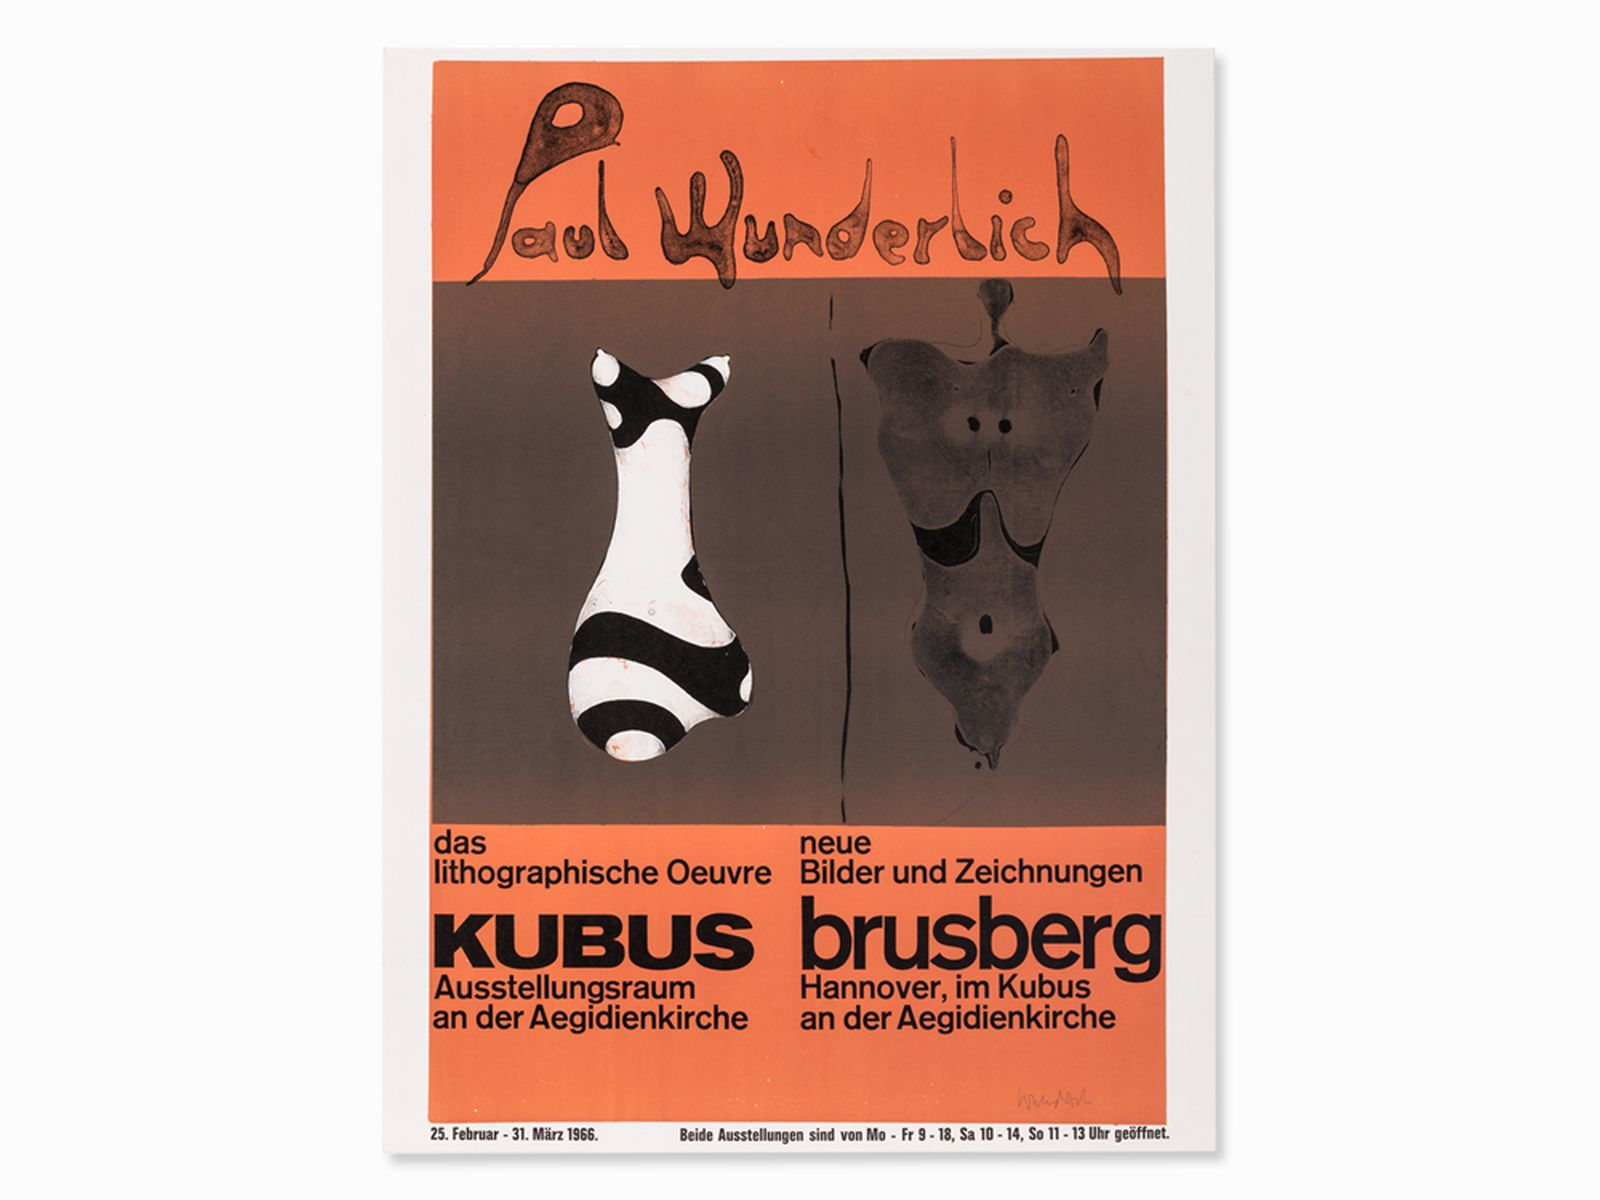 "#124 Paul Wunderlich ""Poster Brusberg"" 1965 | Paul Wunderlich (*1927-2010) ""Plakat Brusberg"" 1965 Image"